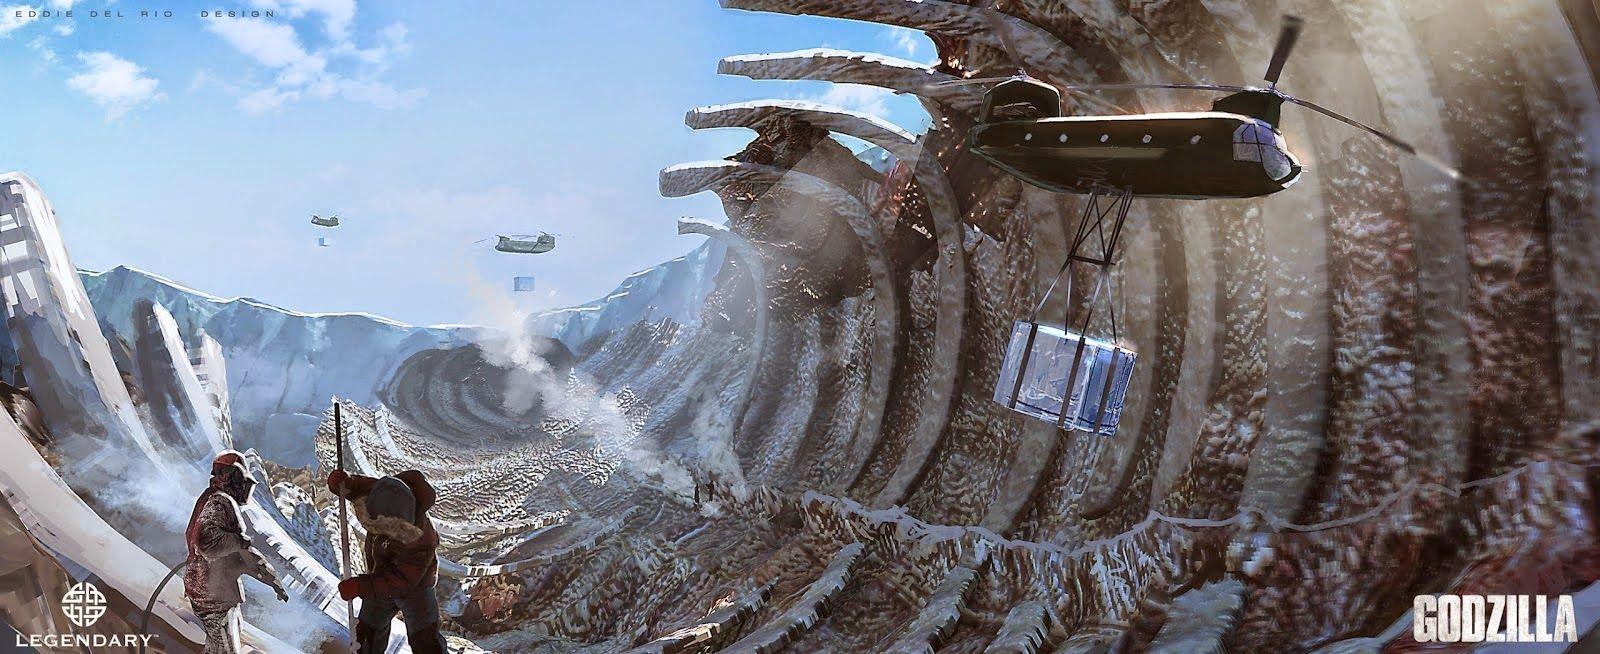 Godzilla (2014) concept art Concept art world, Concept